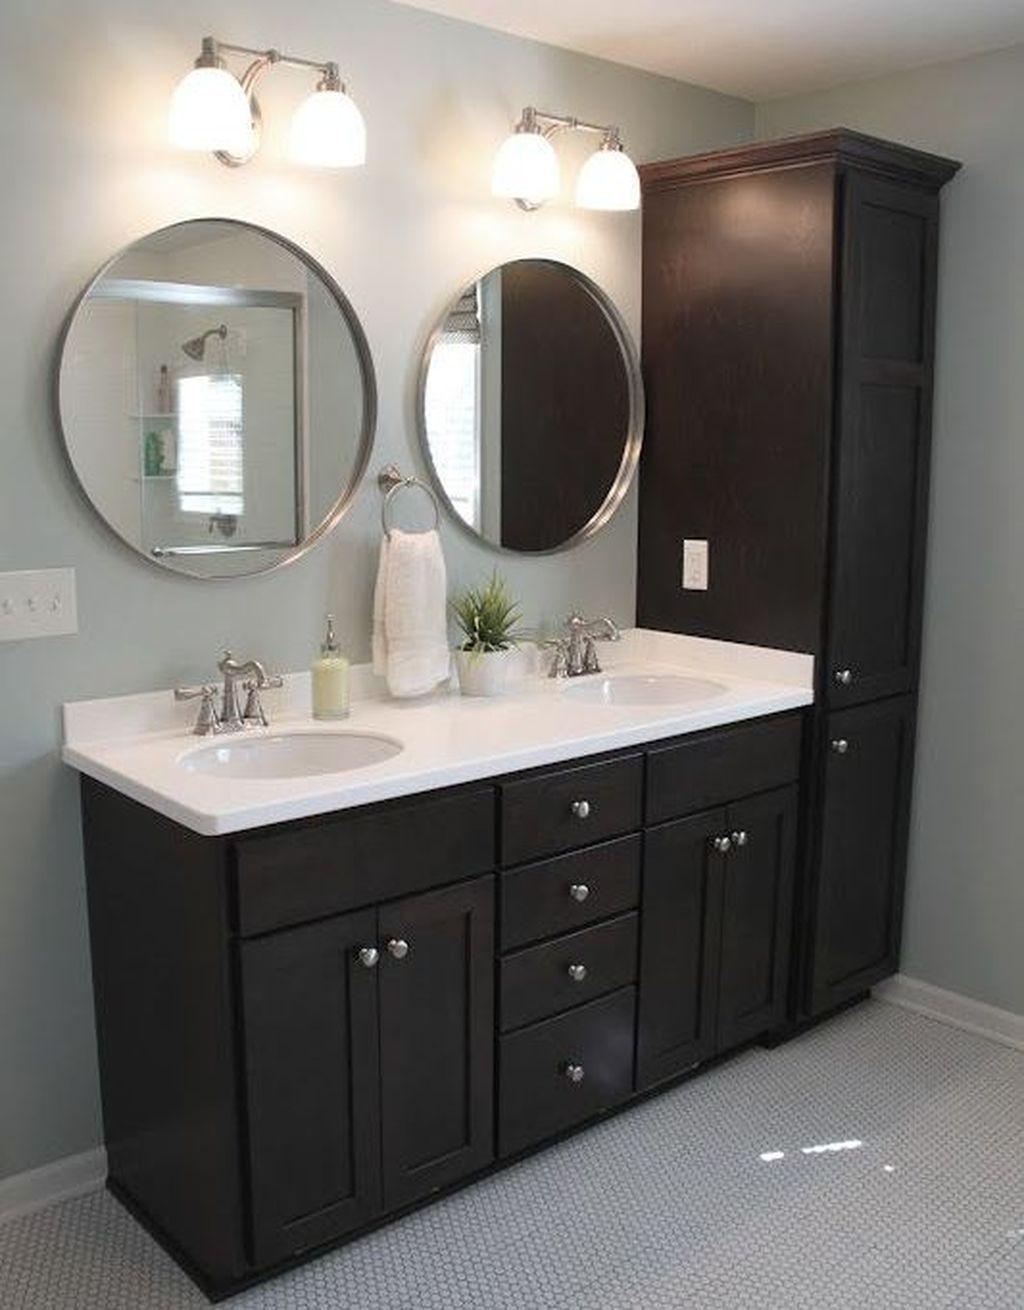 32 Amazing Bathroom Paint Colors Ideas And Inspiration Black